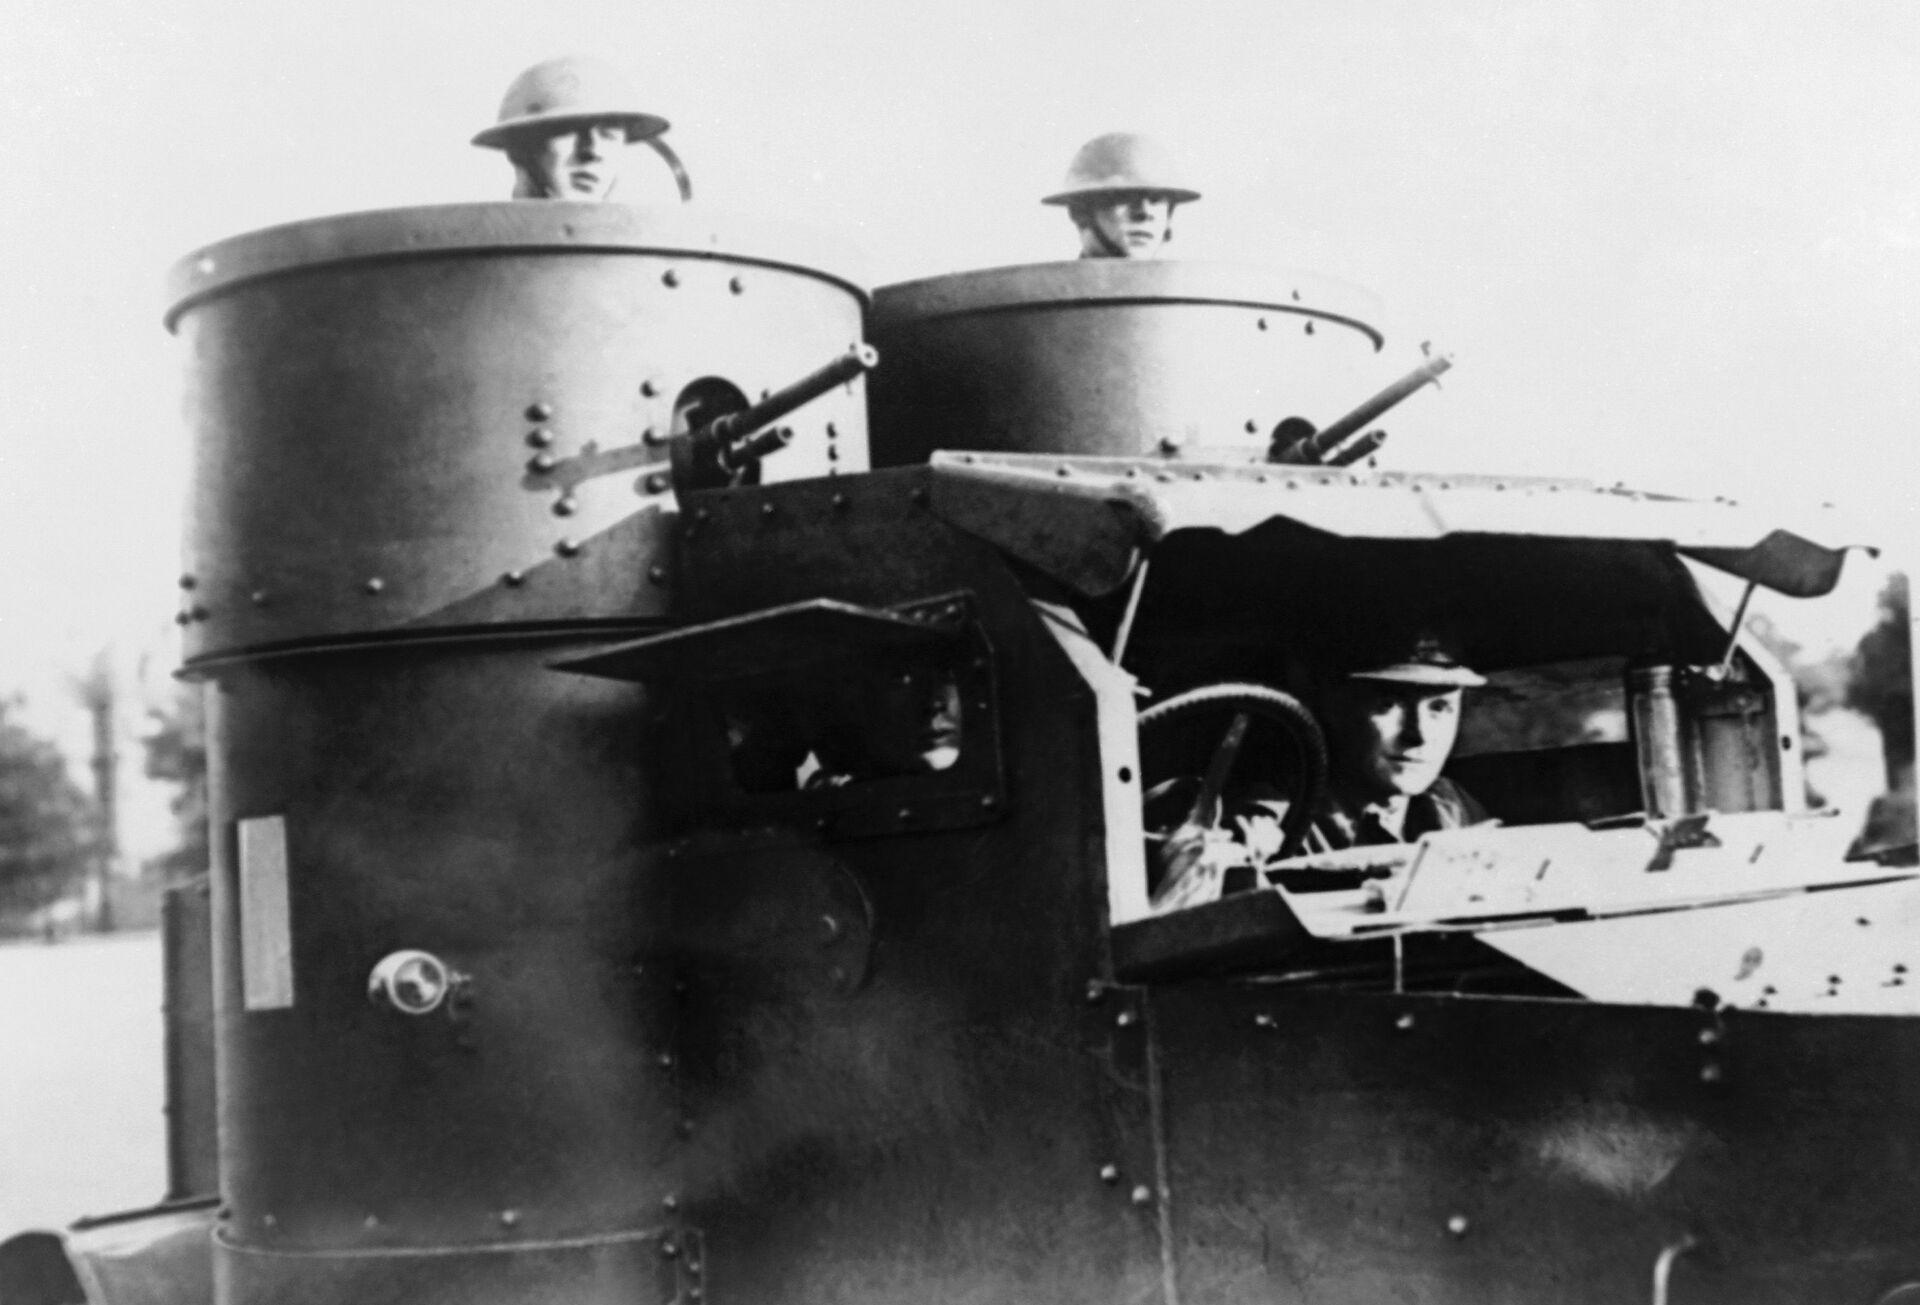 British troops in Ireland in 1920 - Sputnik International, 1920, 08.09.2021